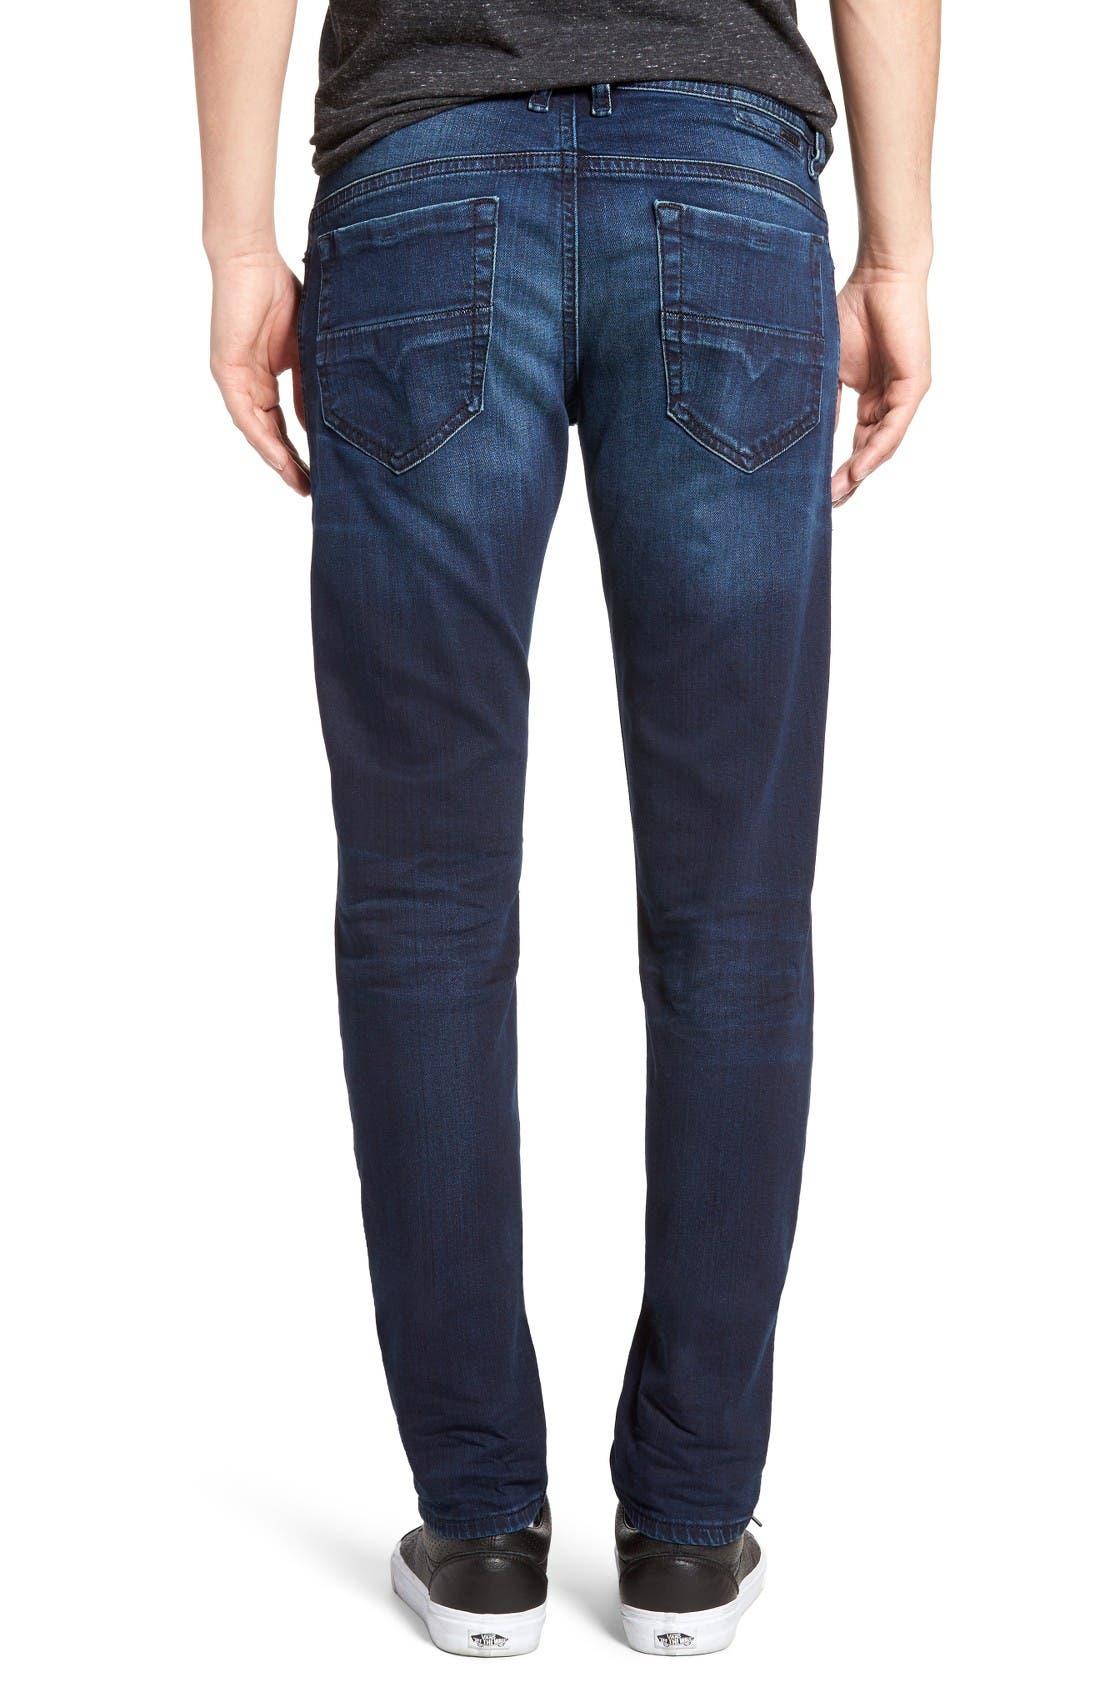 Thommer Skinny Fit Jeans,                             Alternate thumbnail 2, color,                             084Bv